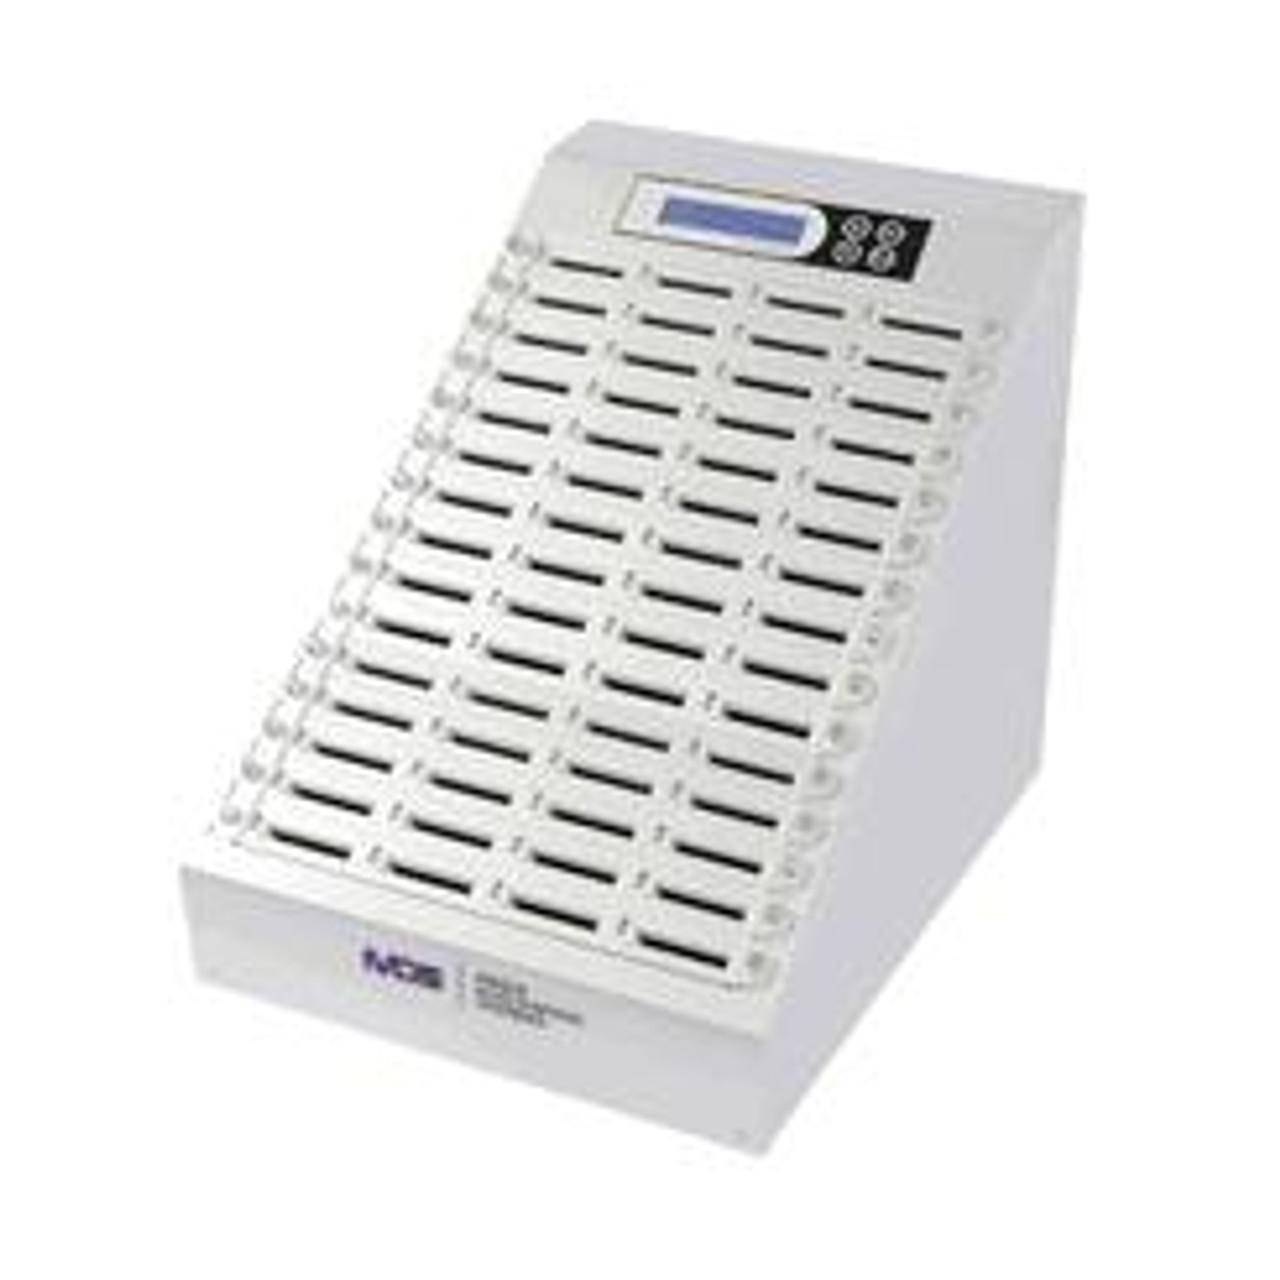 DupliCFast 1 to 59 Compact Flash Memory Card Duplicator